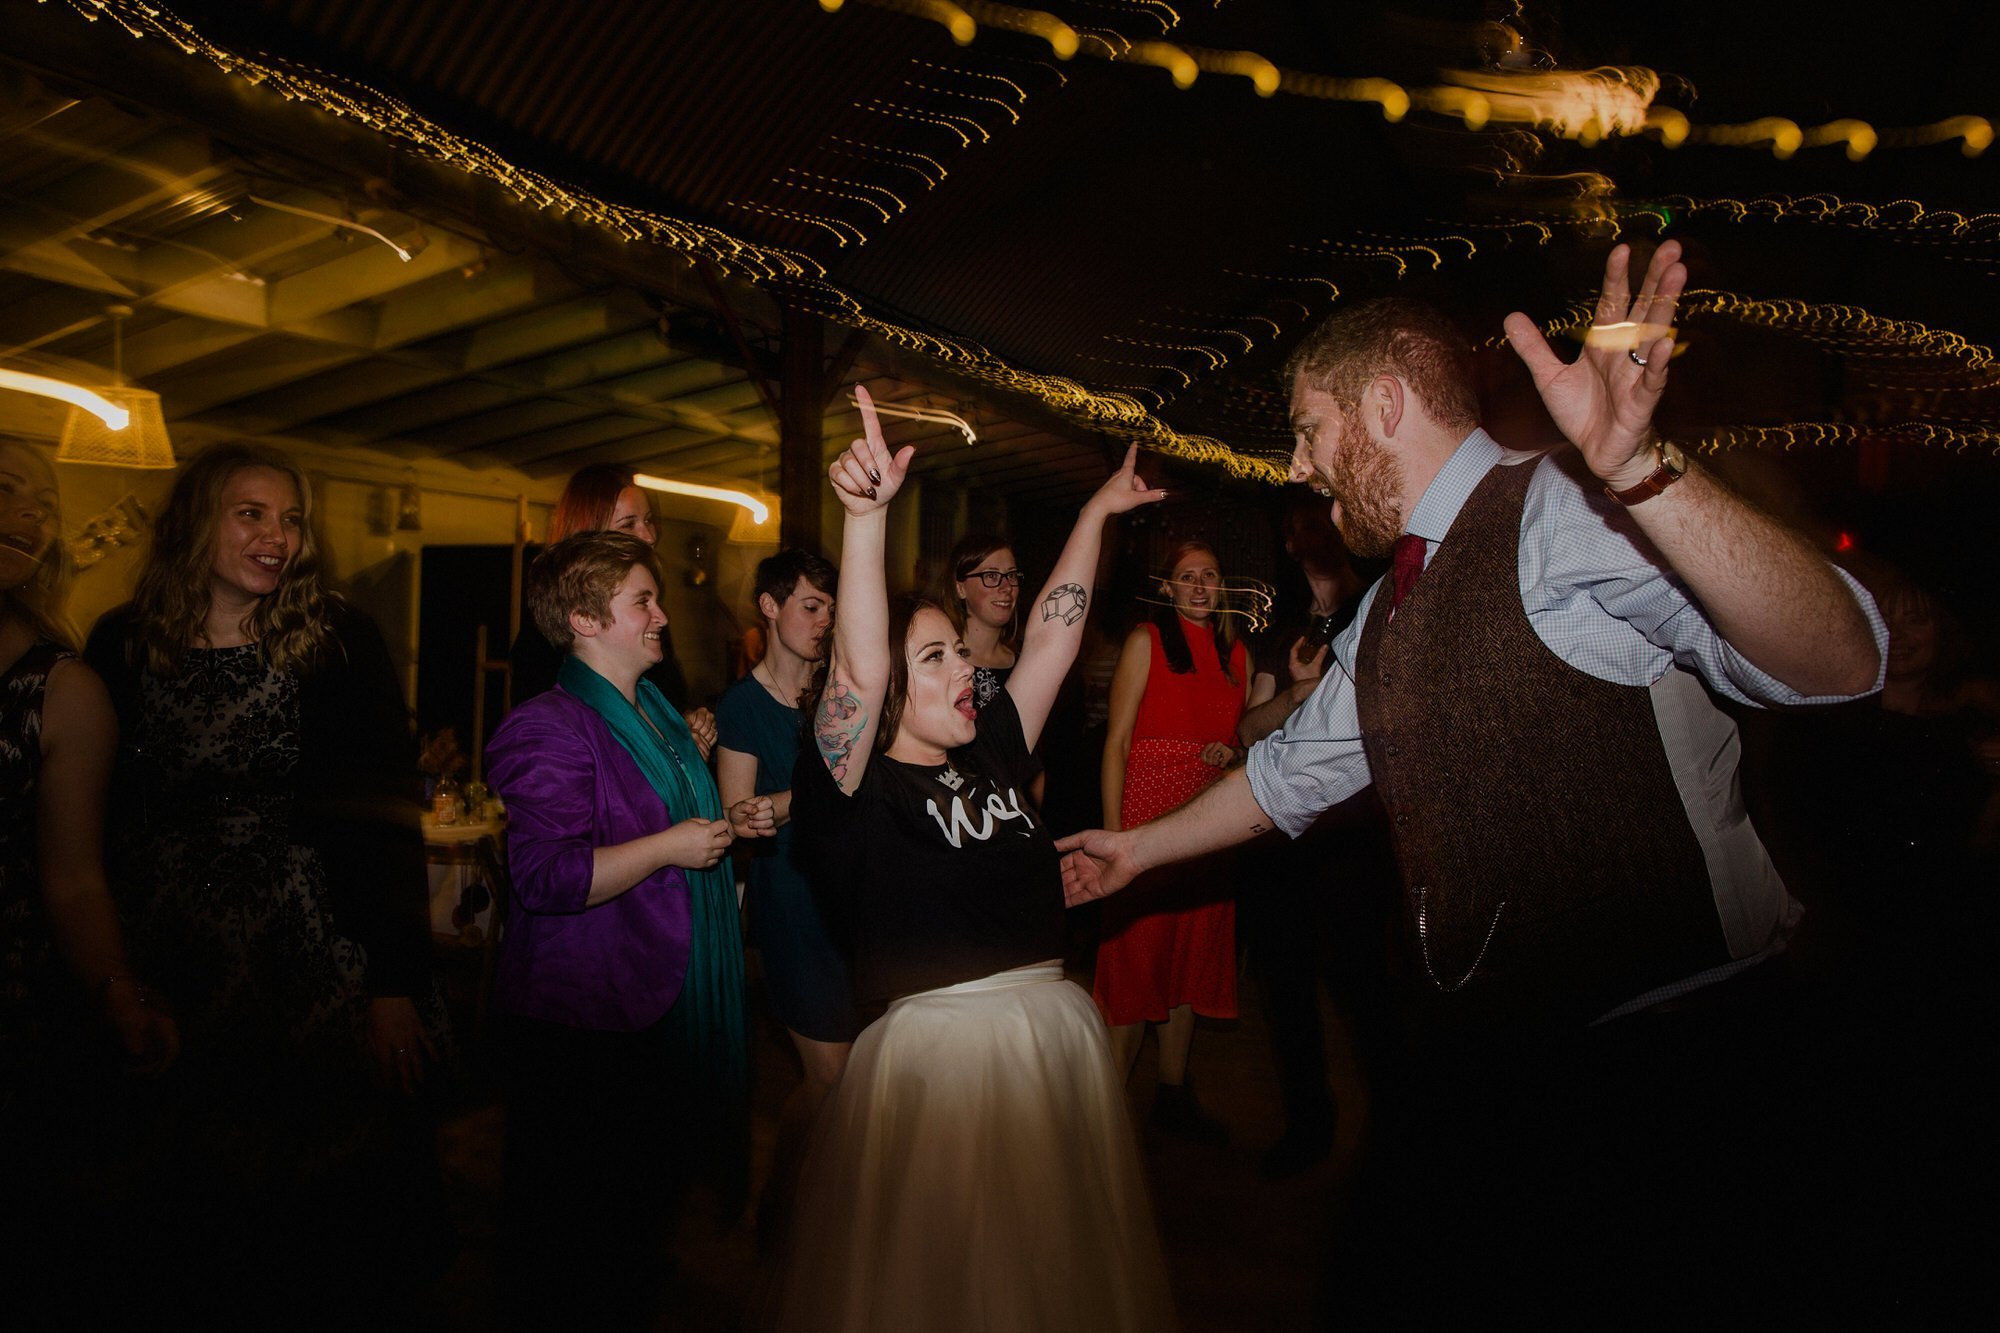 085 TIN SHED KNOCKRAICH FARM WEDDING ALTERNATIVE BRIDE ZOE ALEXANDRA PHOTOGRAPHY